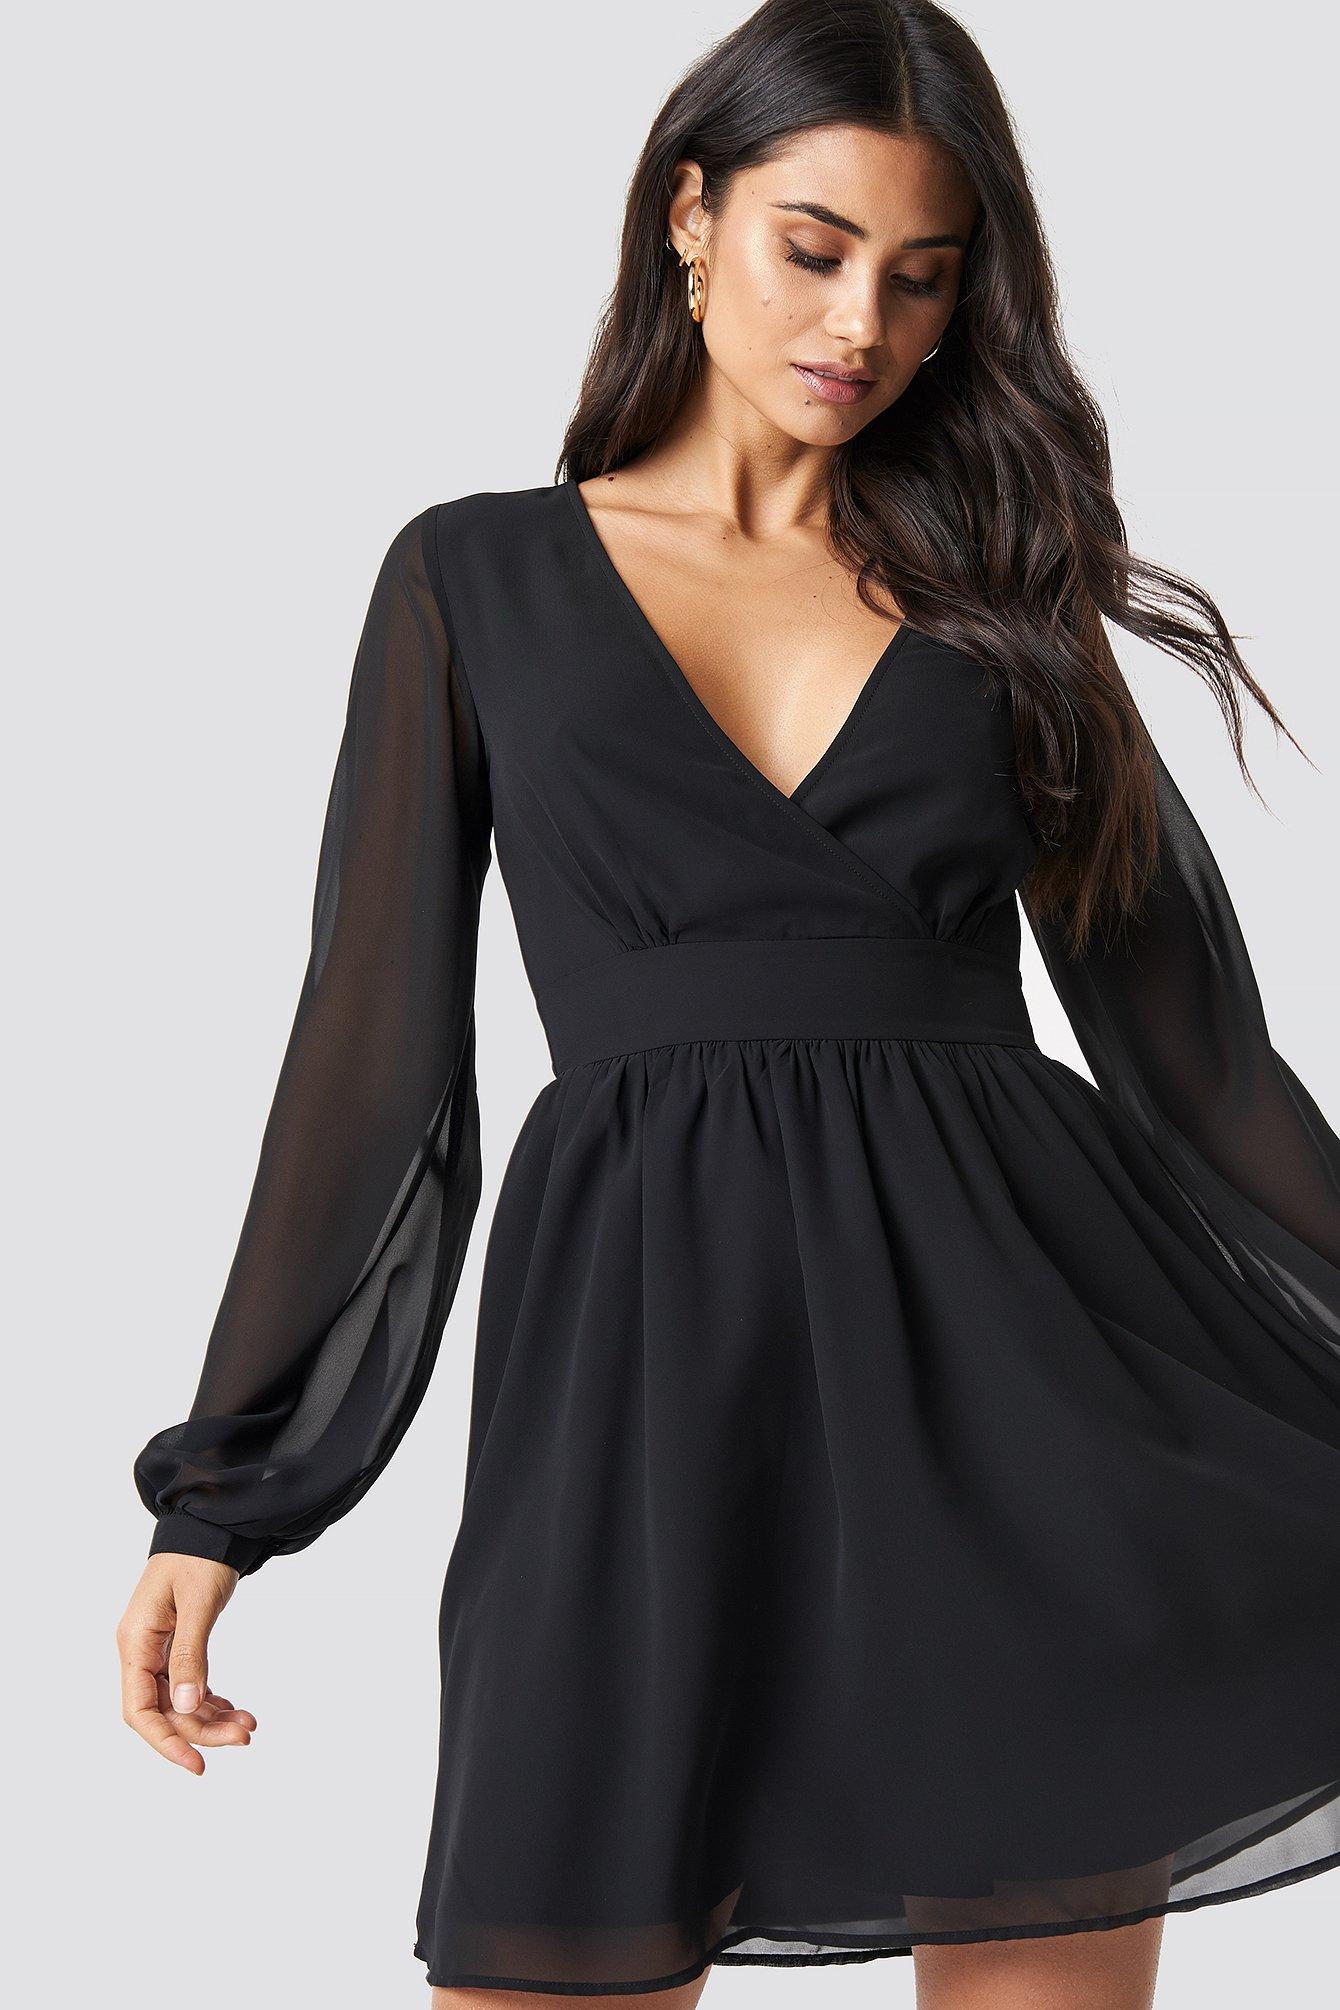 dilara x na-kd -  Front Overlap Mini Dress - Black